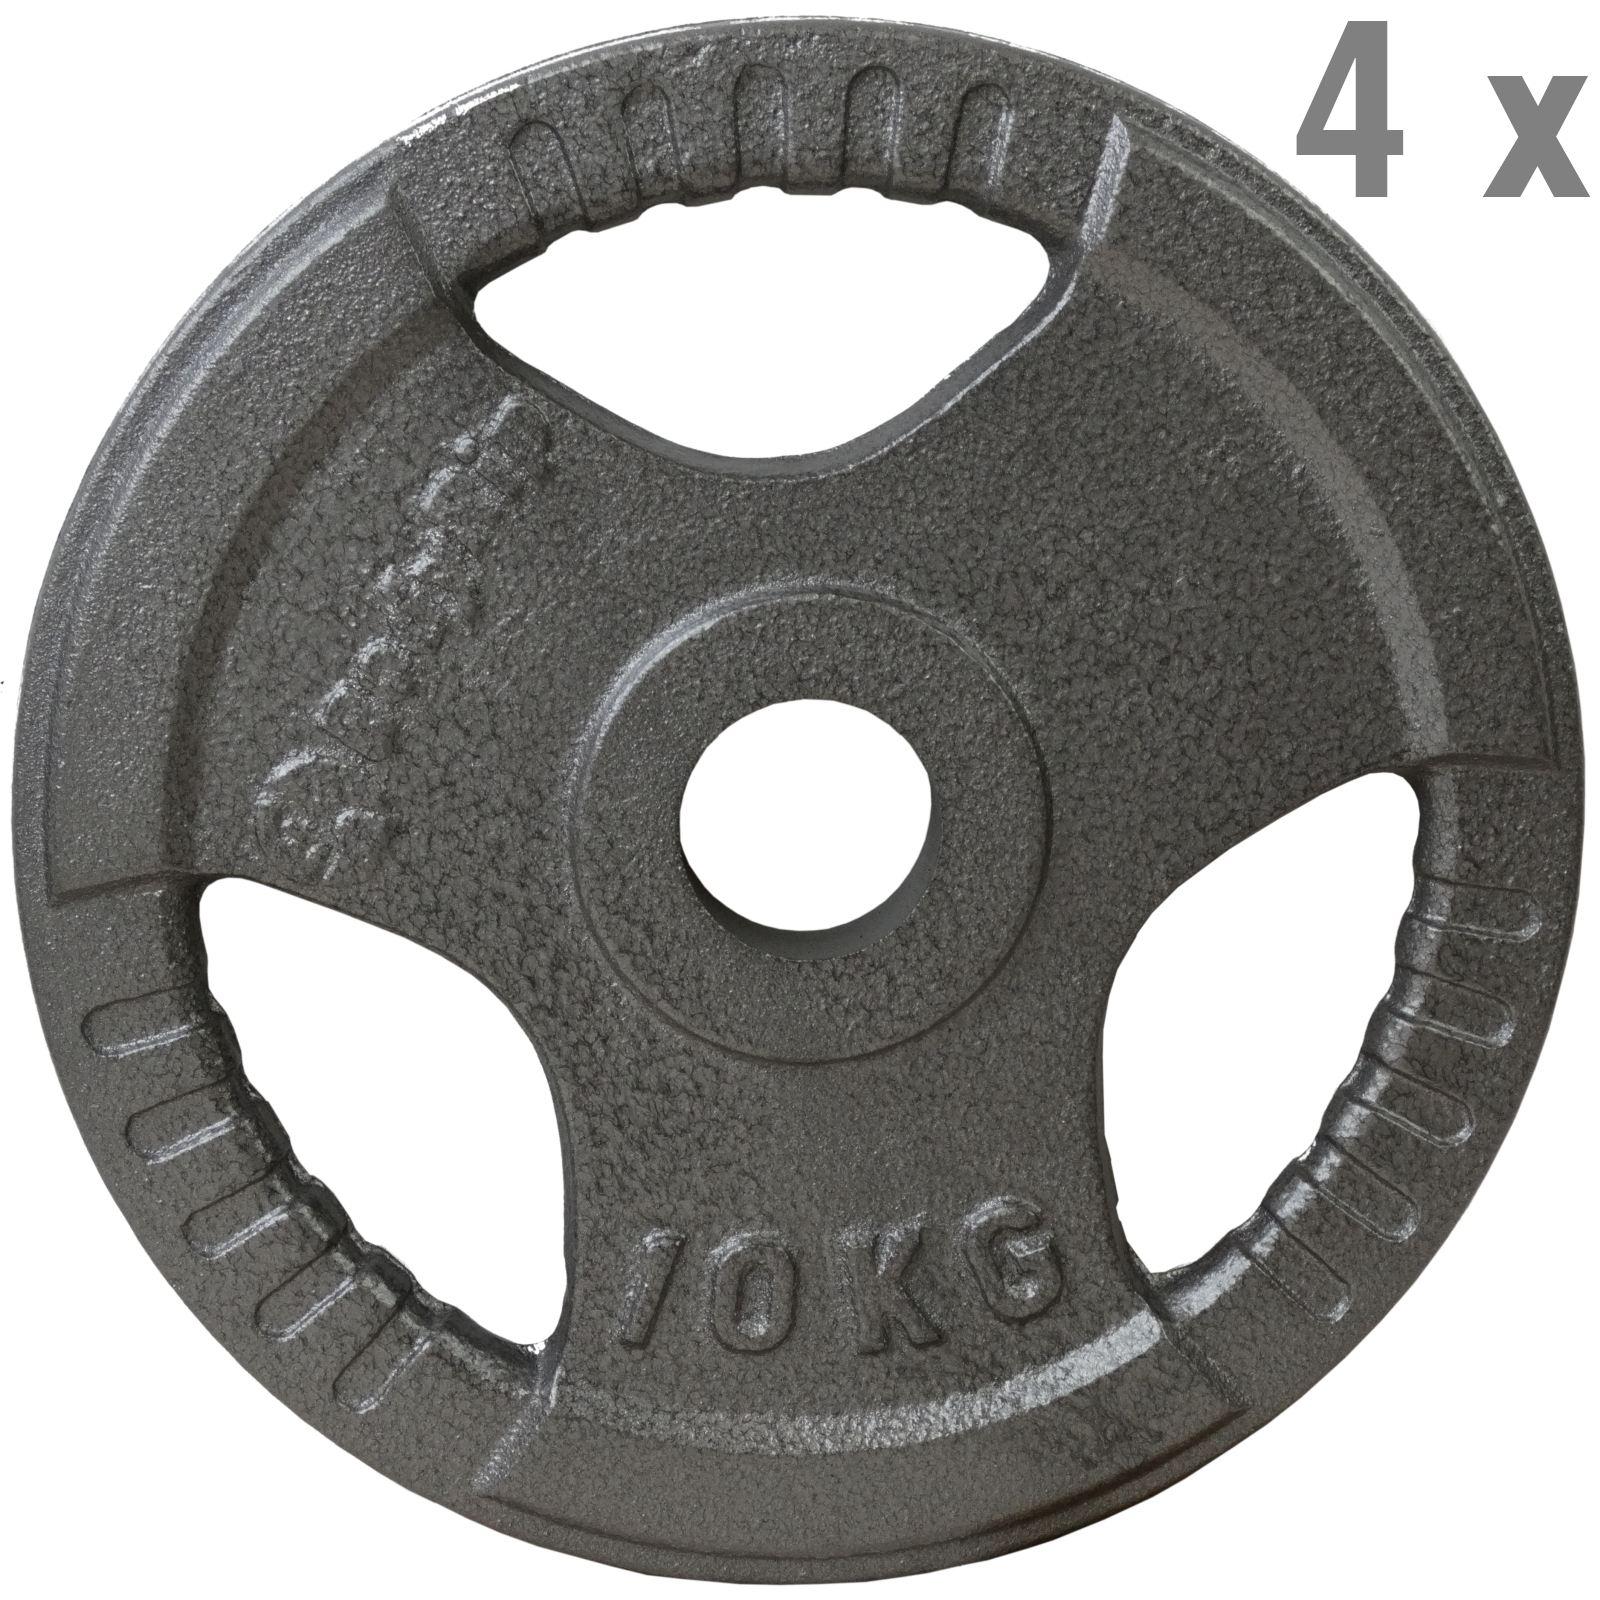 Tri grip olympic weight plates disc discs gym train cast